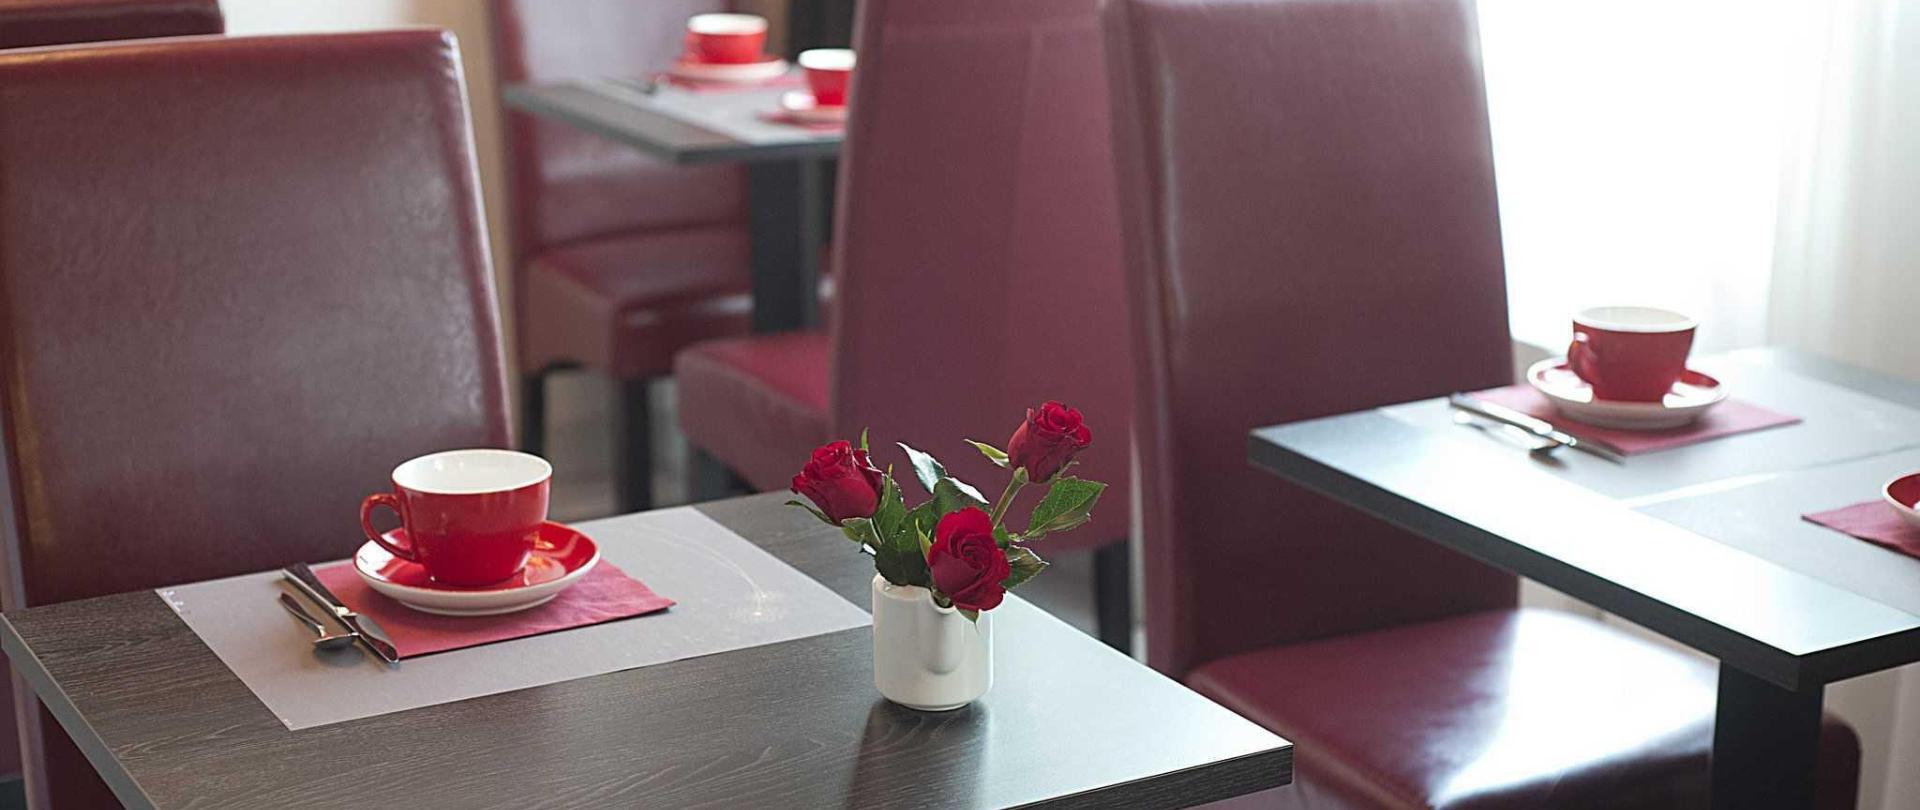 petit-d-jeuner-1-hotel-clermont-ferrand-pardieu-belle-inn.jpg